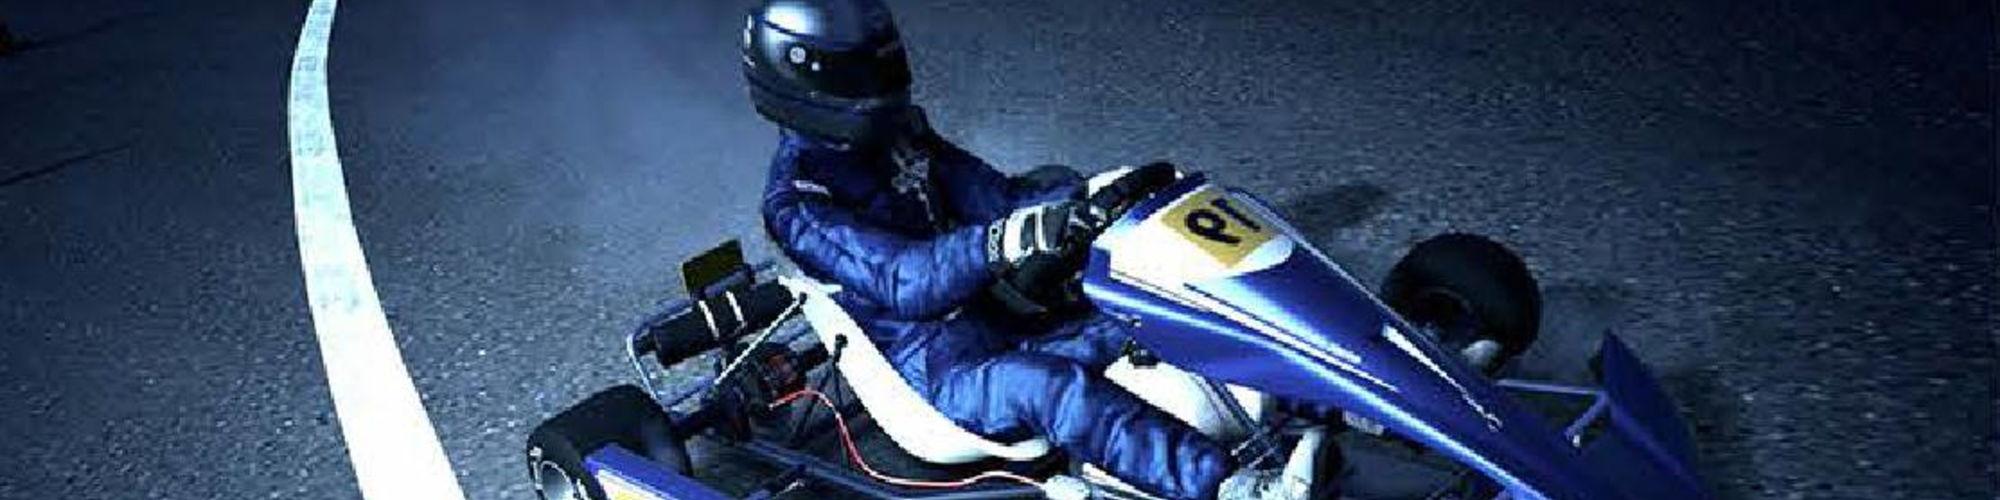 DOOS Karting  cover image